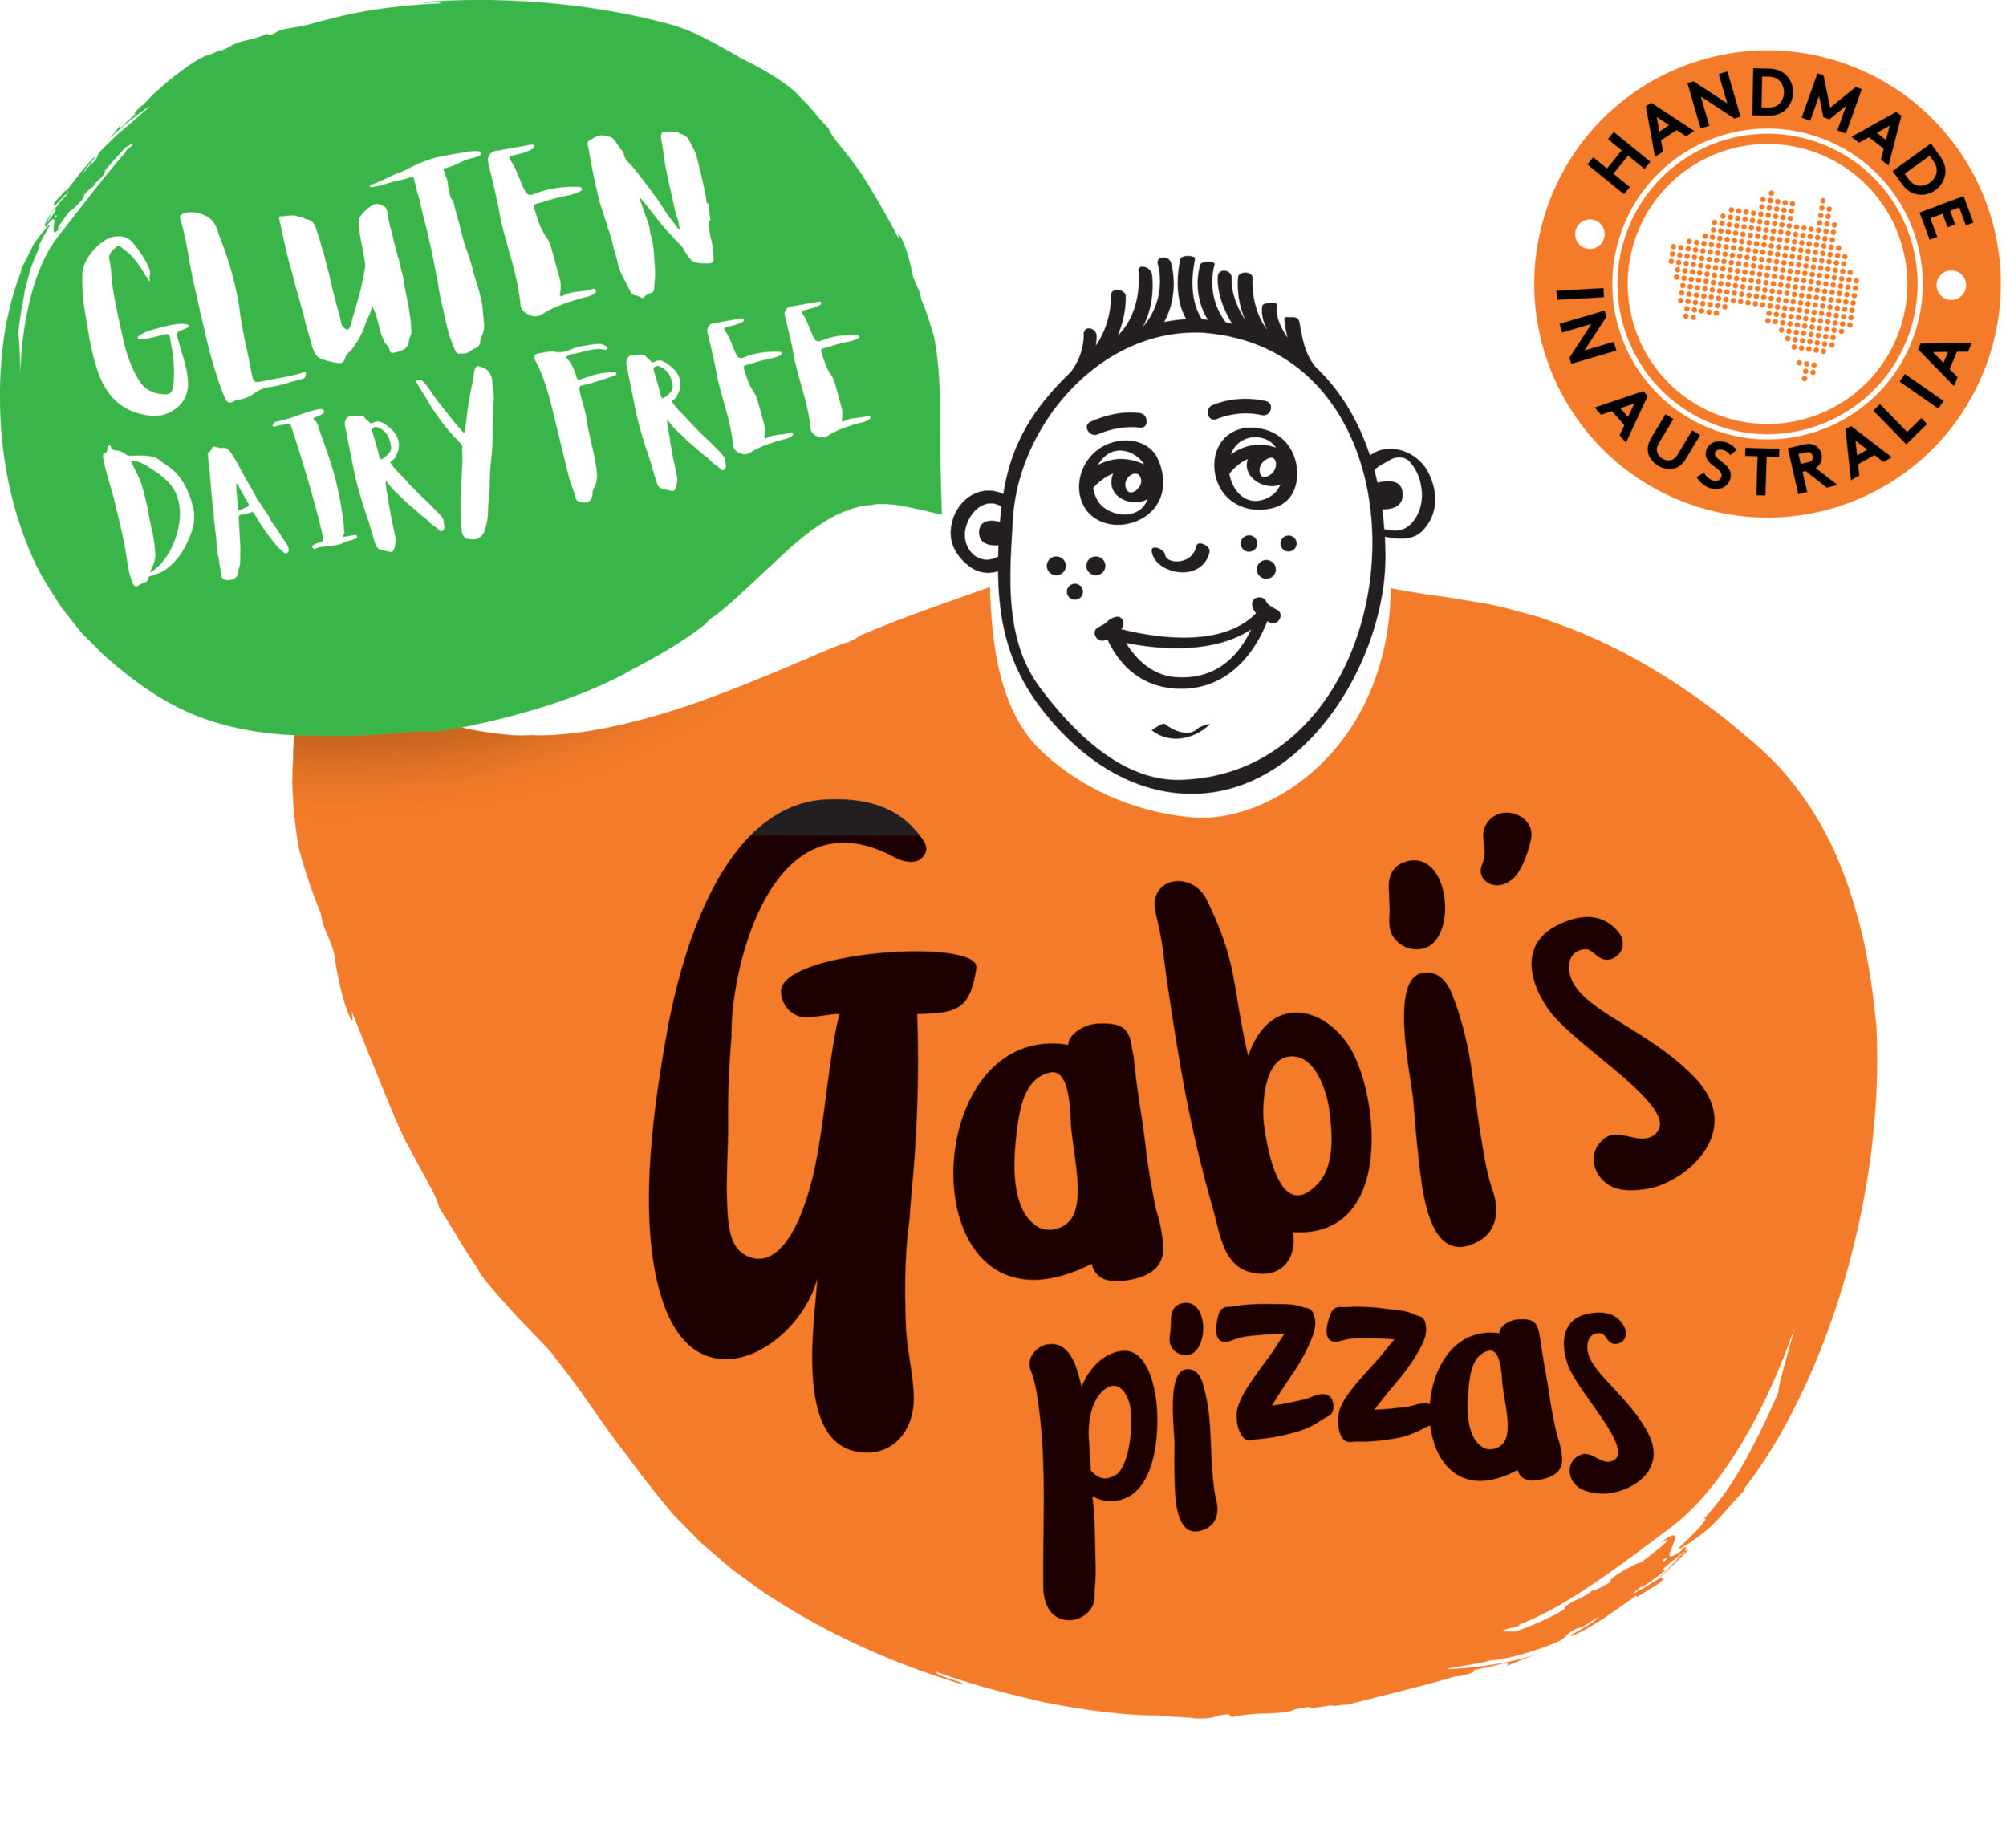 gabis-pizza.png